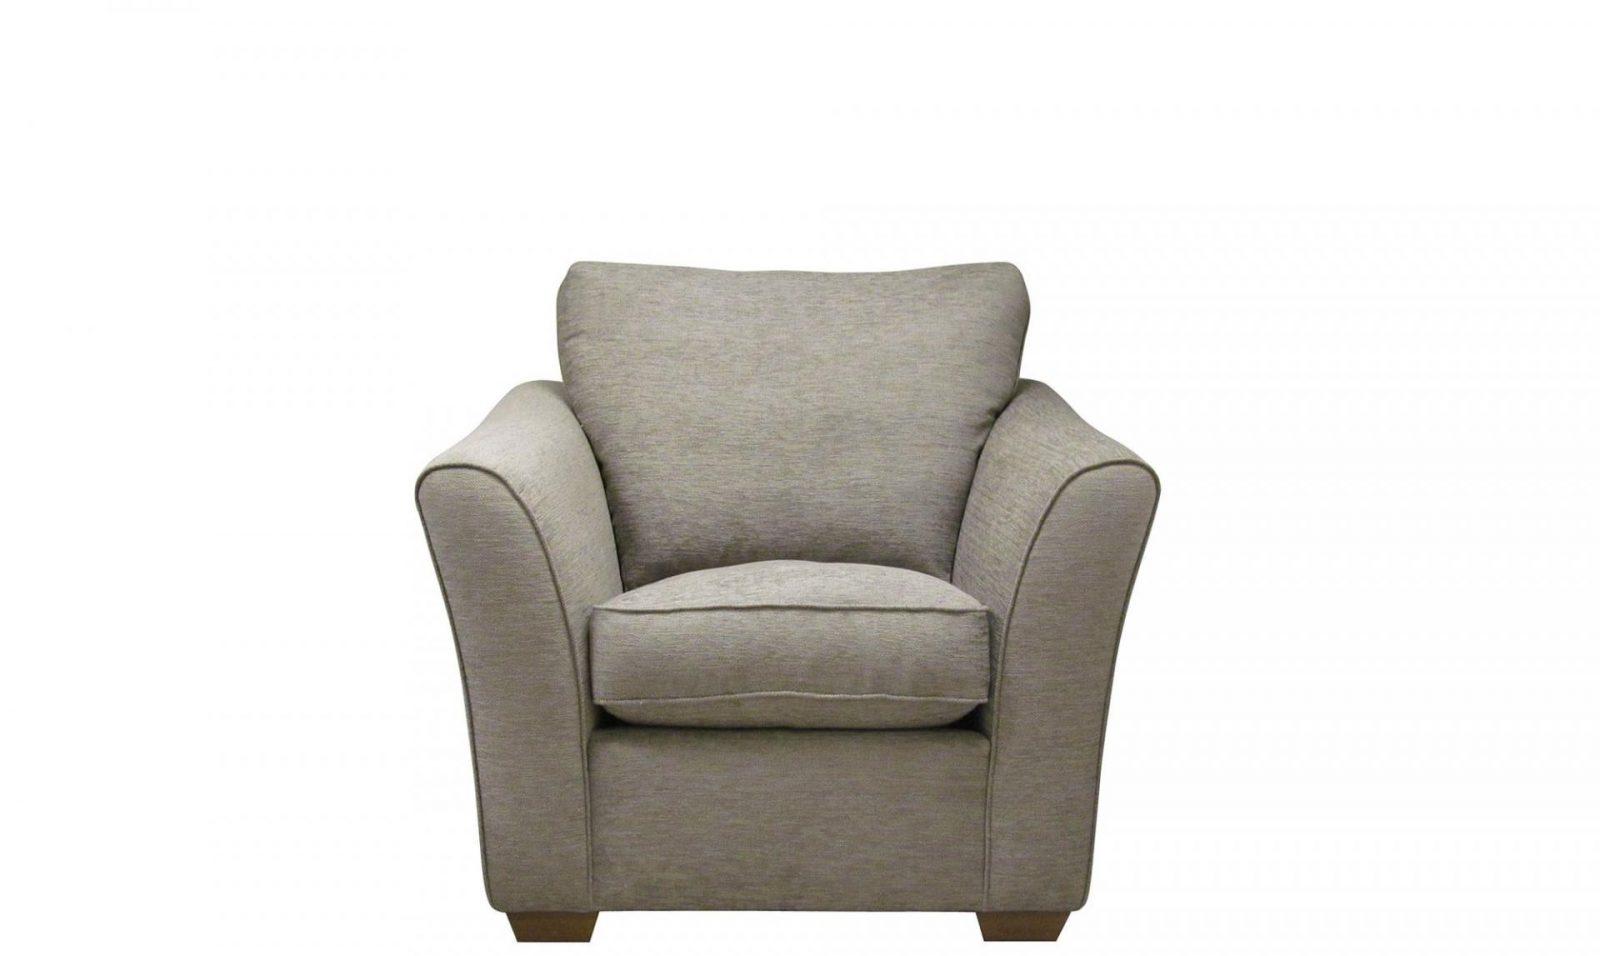 Portland Chair by Fishpools